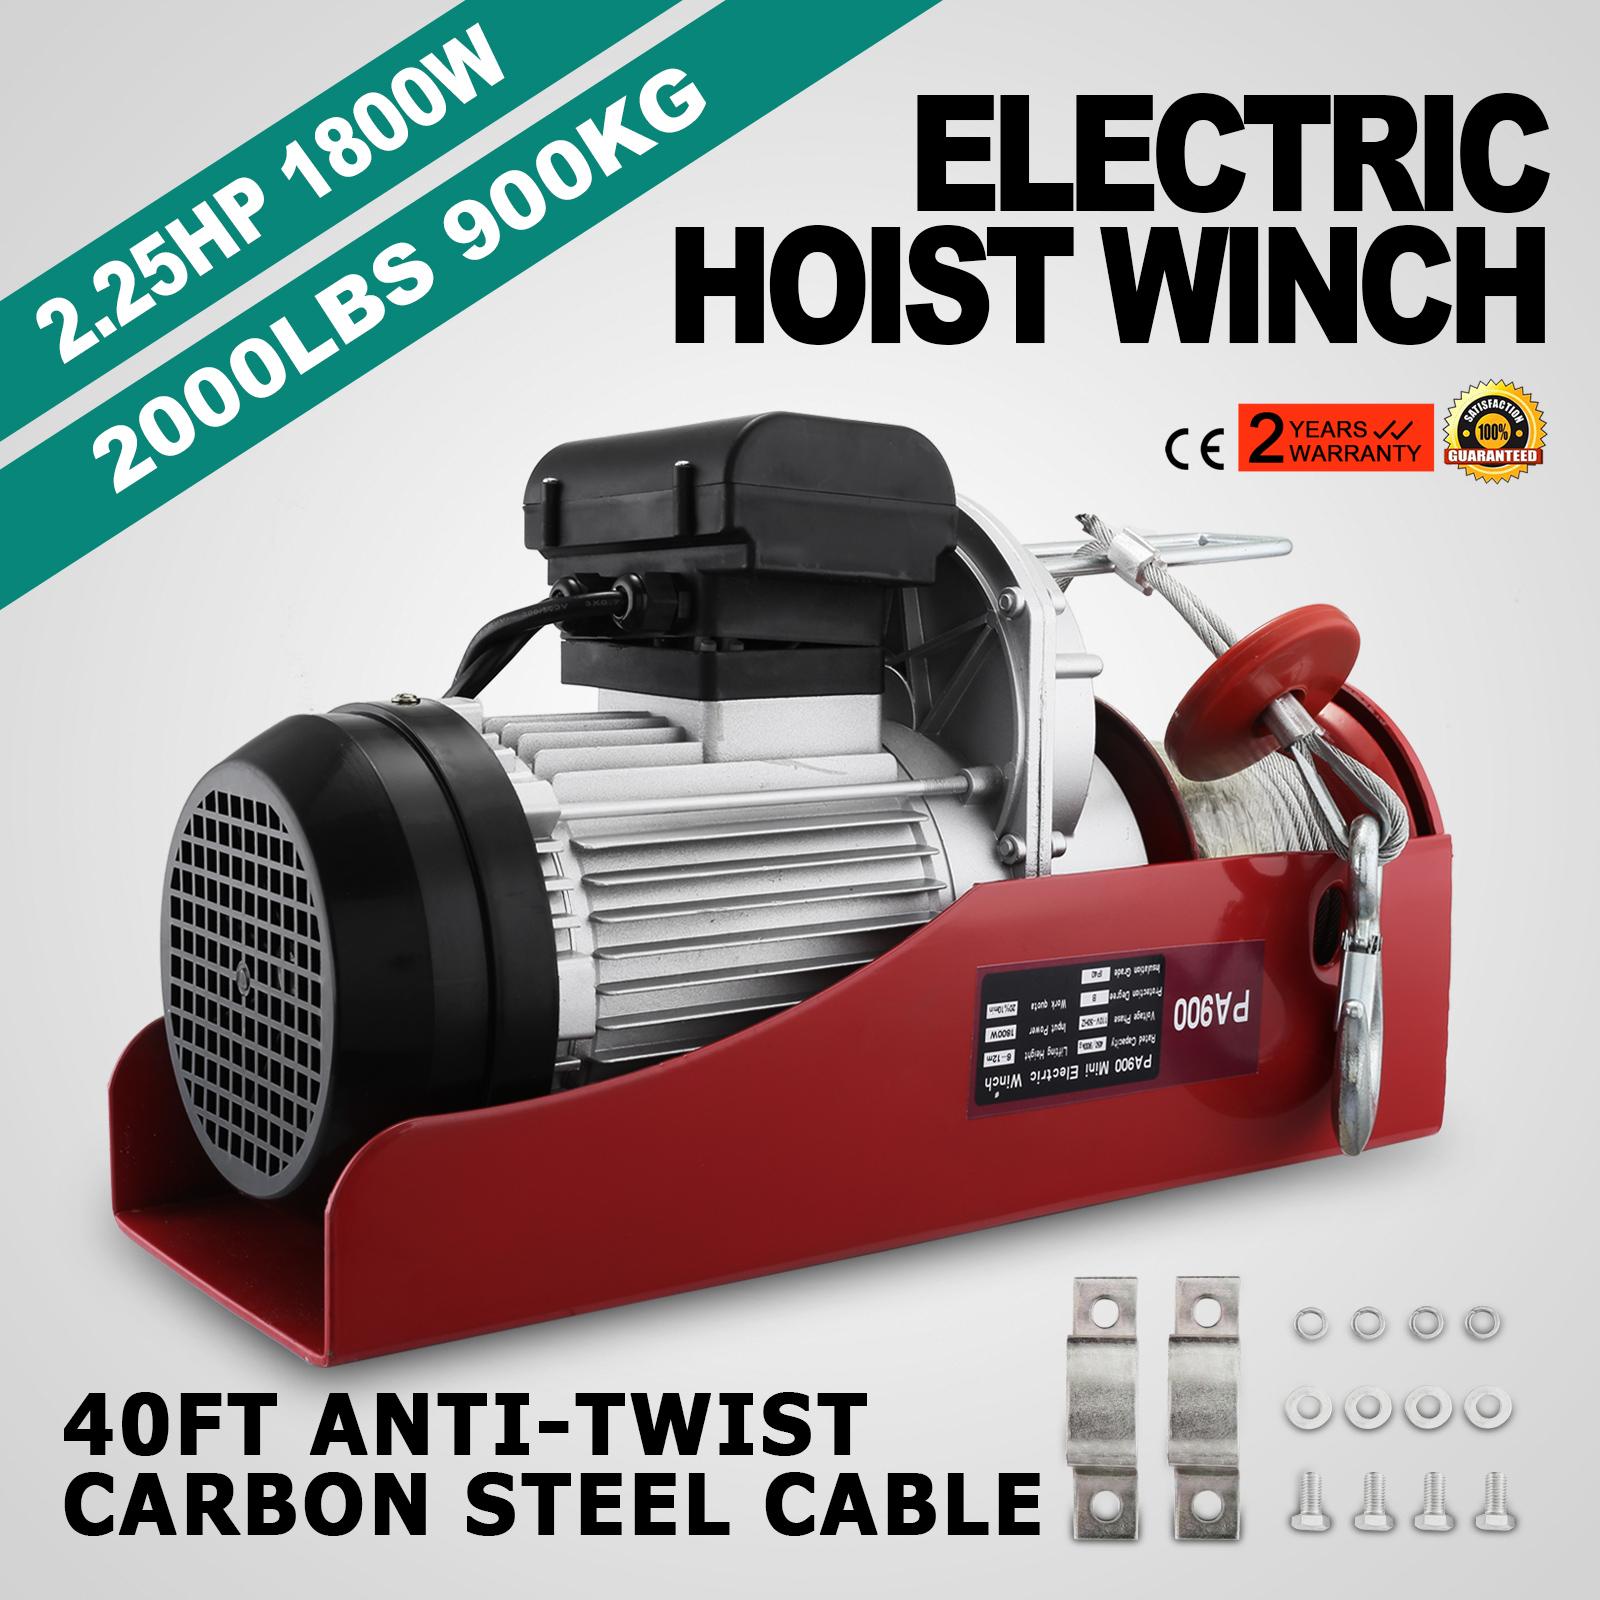 100kg-900kg-Electric-Hoist-Winch-Lifting-Engine-Crane-Cable-Lift-Hook-Garage miniature 61